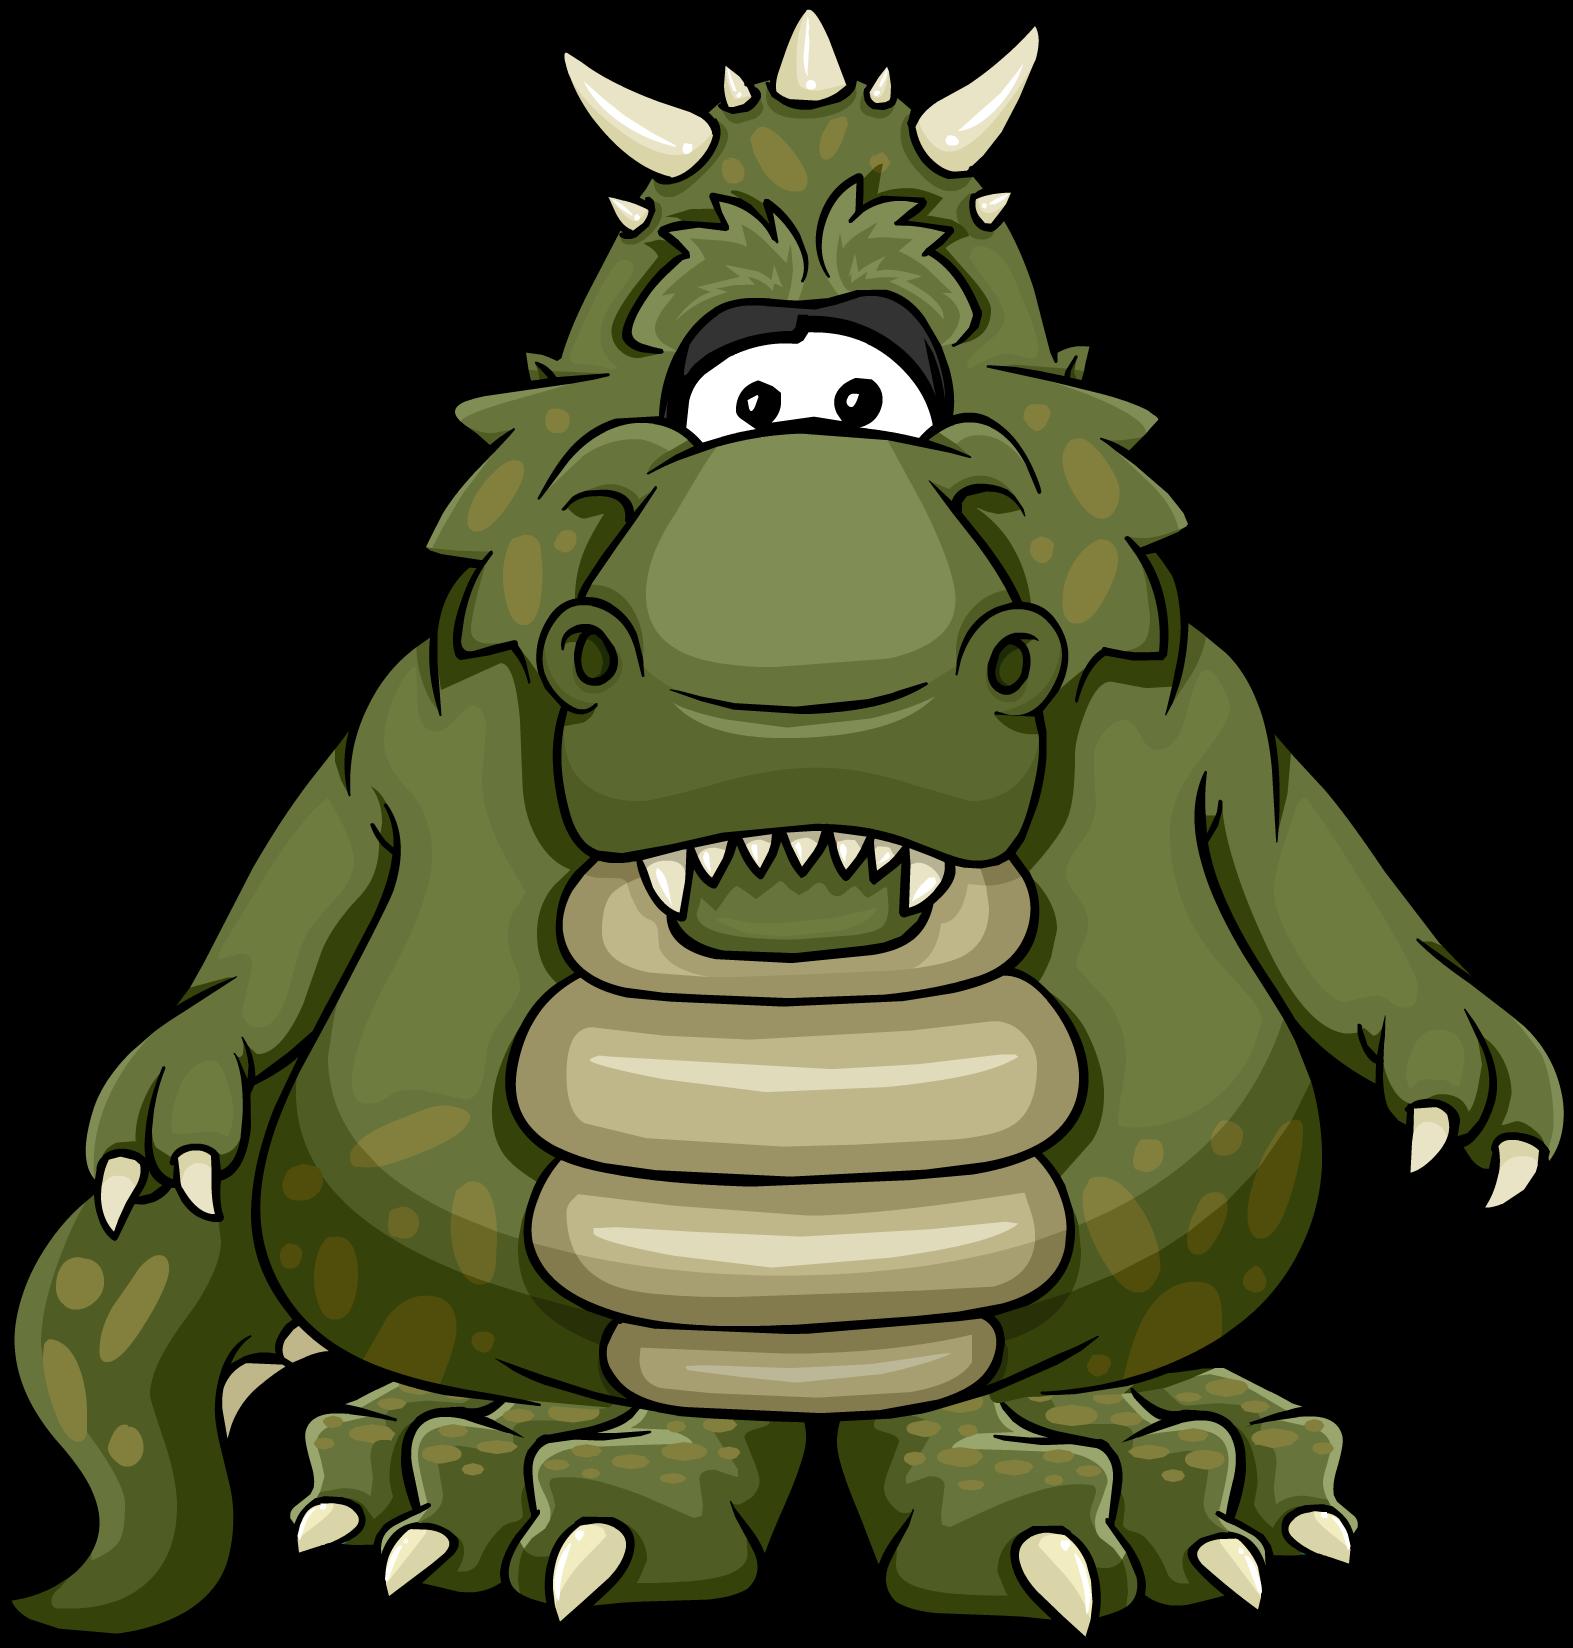 Swamp clipart crocodile swamp. Dinosaurus rex creature club